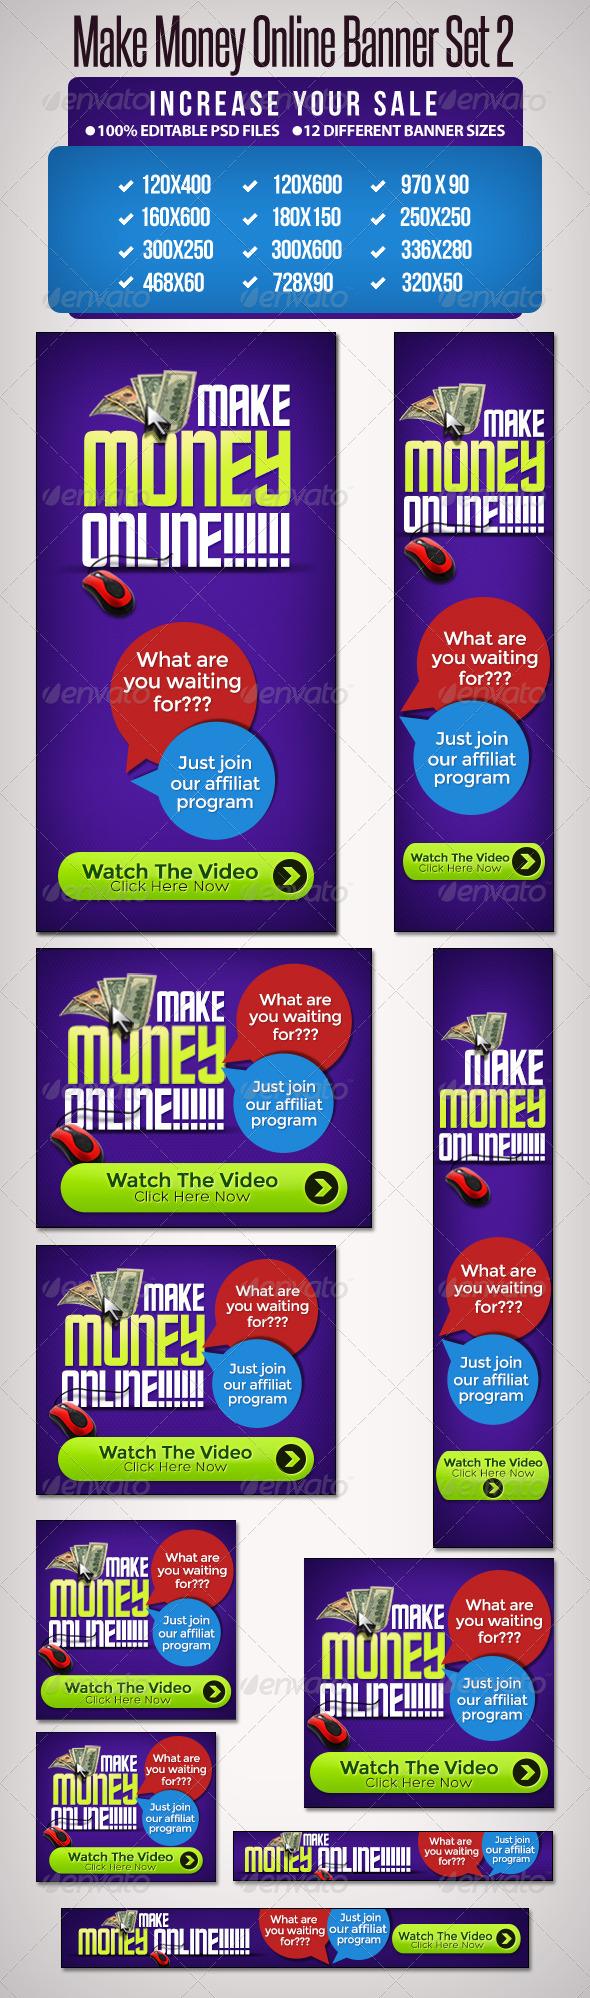 GraphicRiver Make Money Online Set 2 12 Google Standard Sizes 5250632